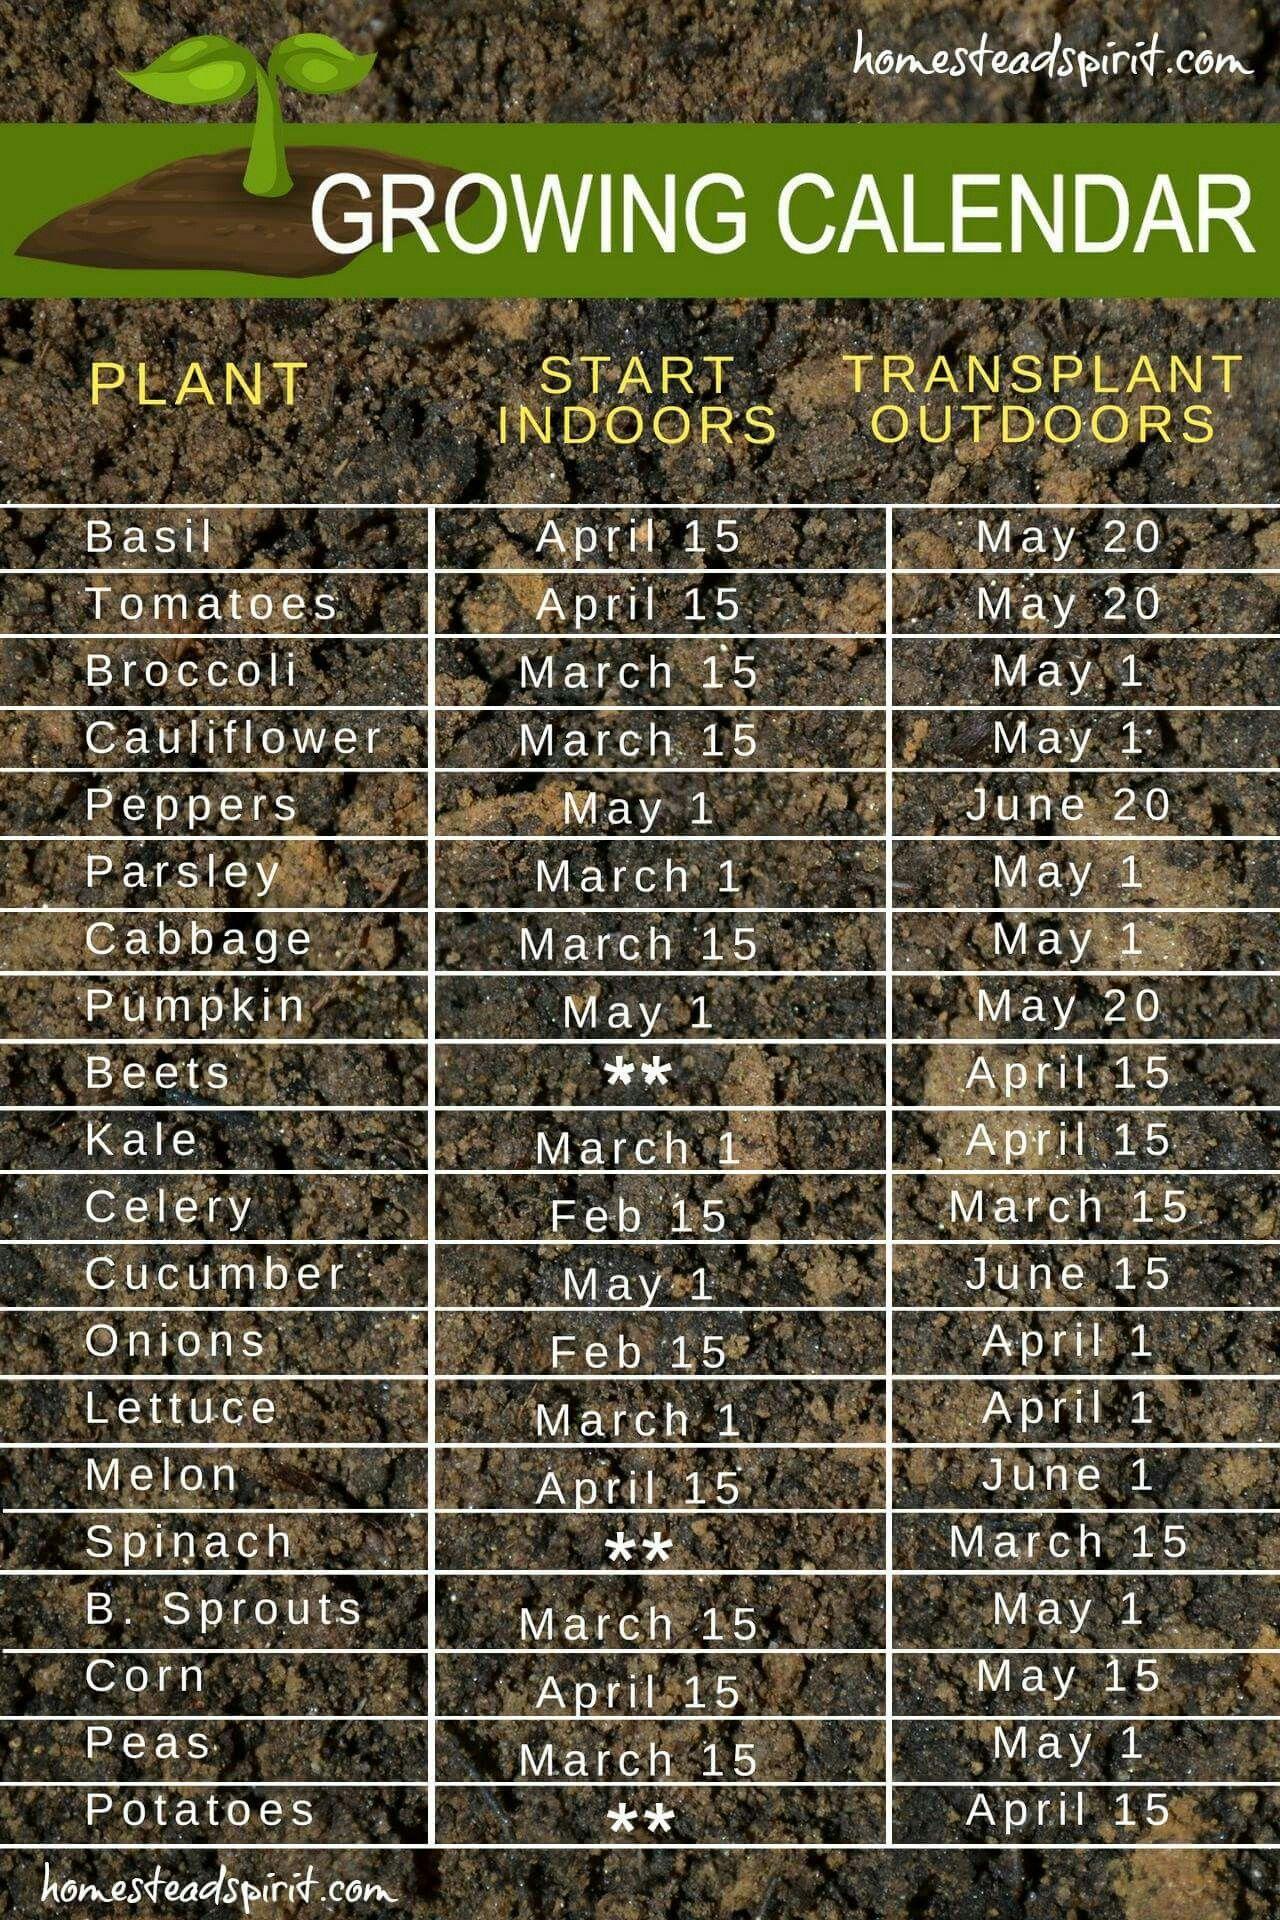 Gemüsegarten kalender  Growing calendar for starting seeds indoors and transplanting ...